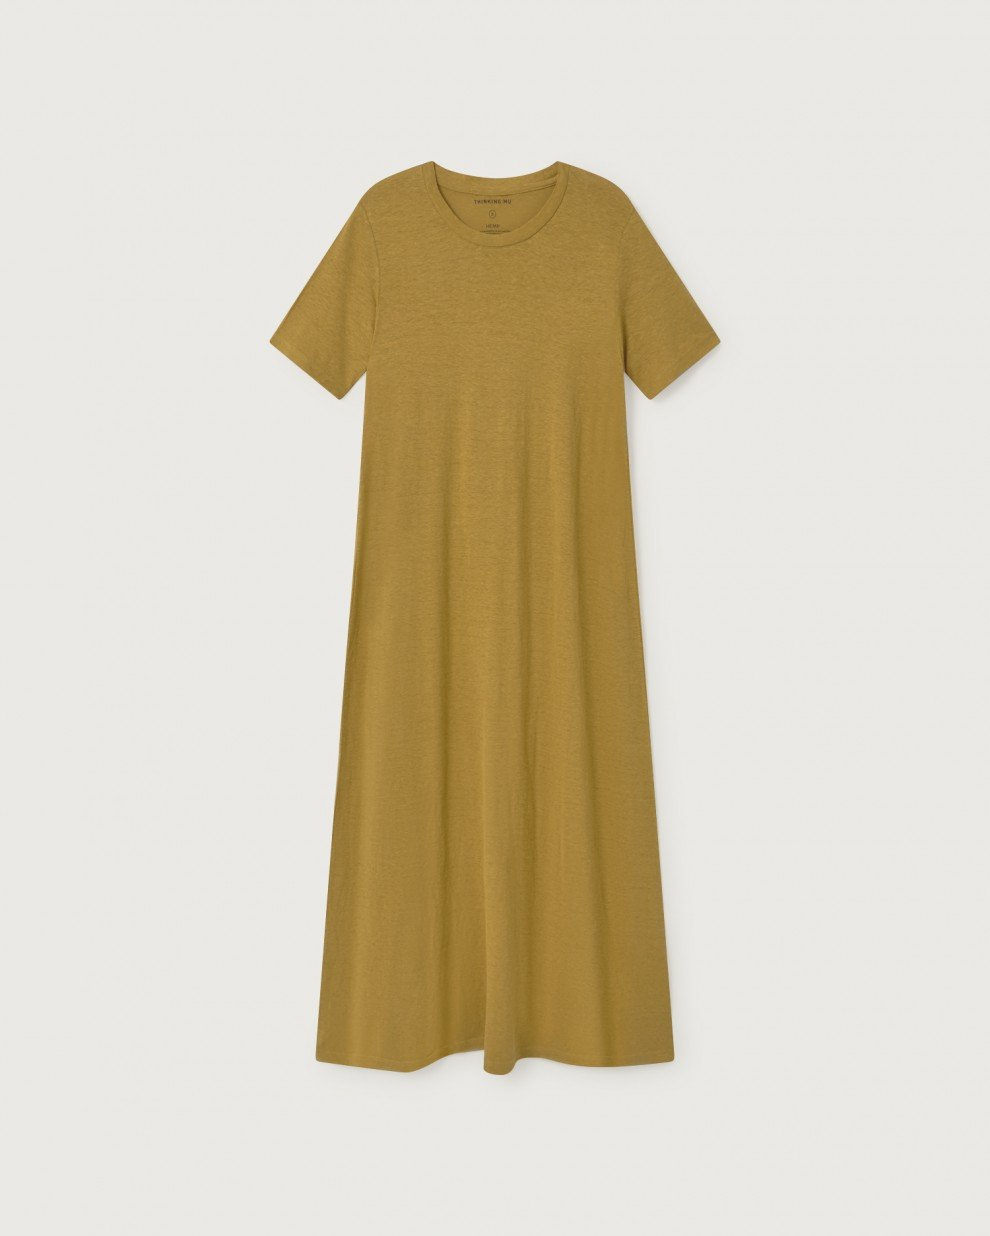 Image of Thinking Mu  Oueme Hemp Dress in Mustard